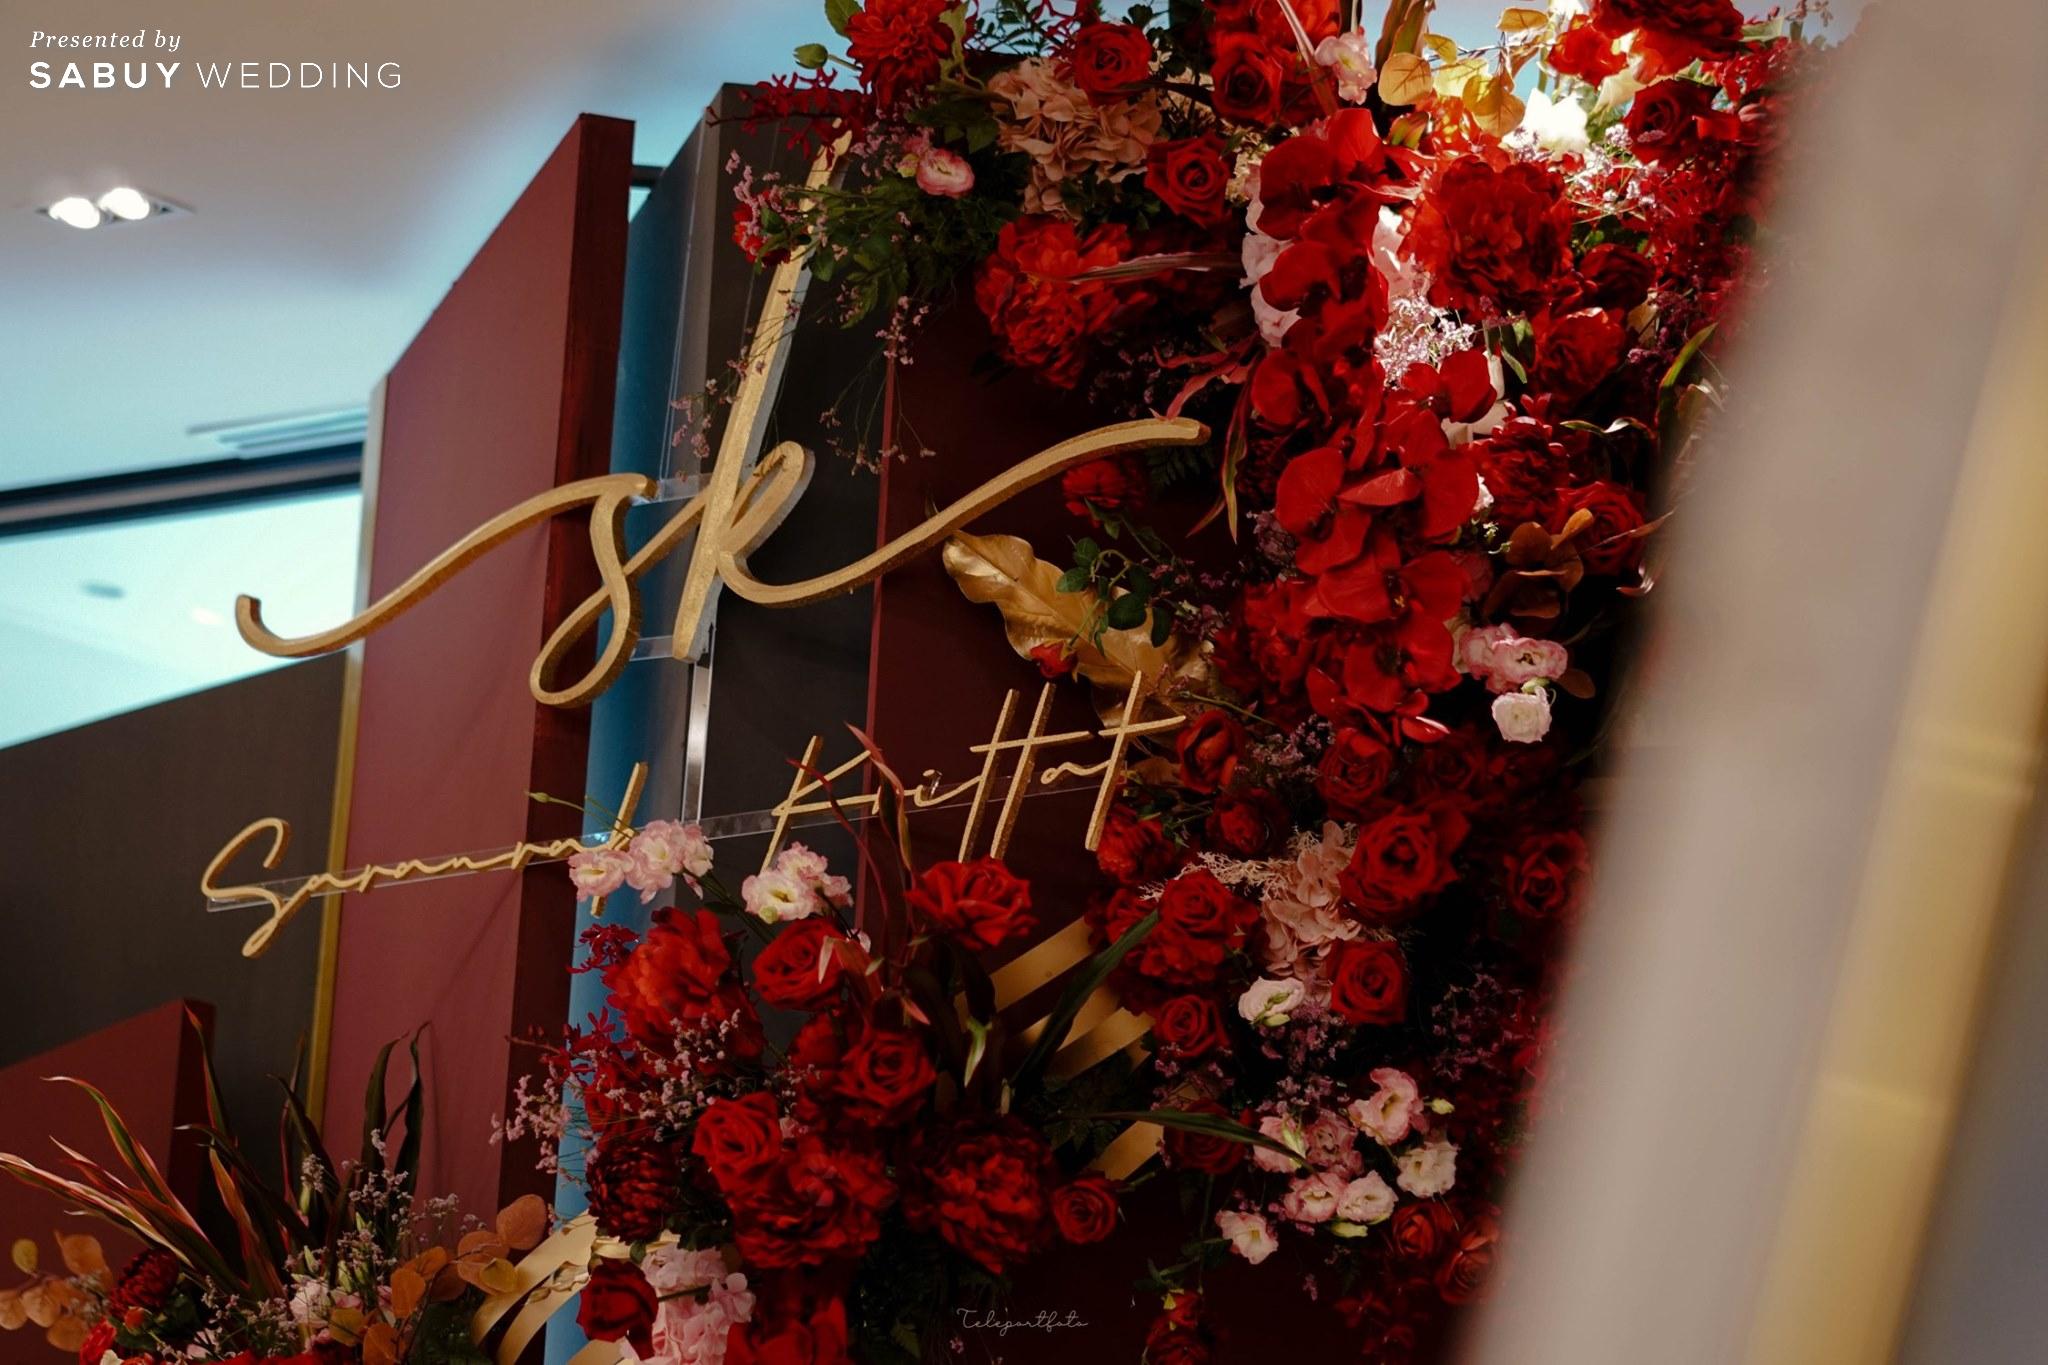 backdrop,ตกแต่งงานแต่ง,ออแกไนเซอร์ รีวิวงานแต่งสวยปังดูแพง กับโทนสี Red Burgundy @ Chatrium Hotel Riverside Bangkok